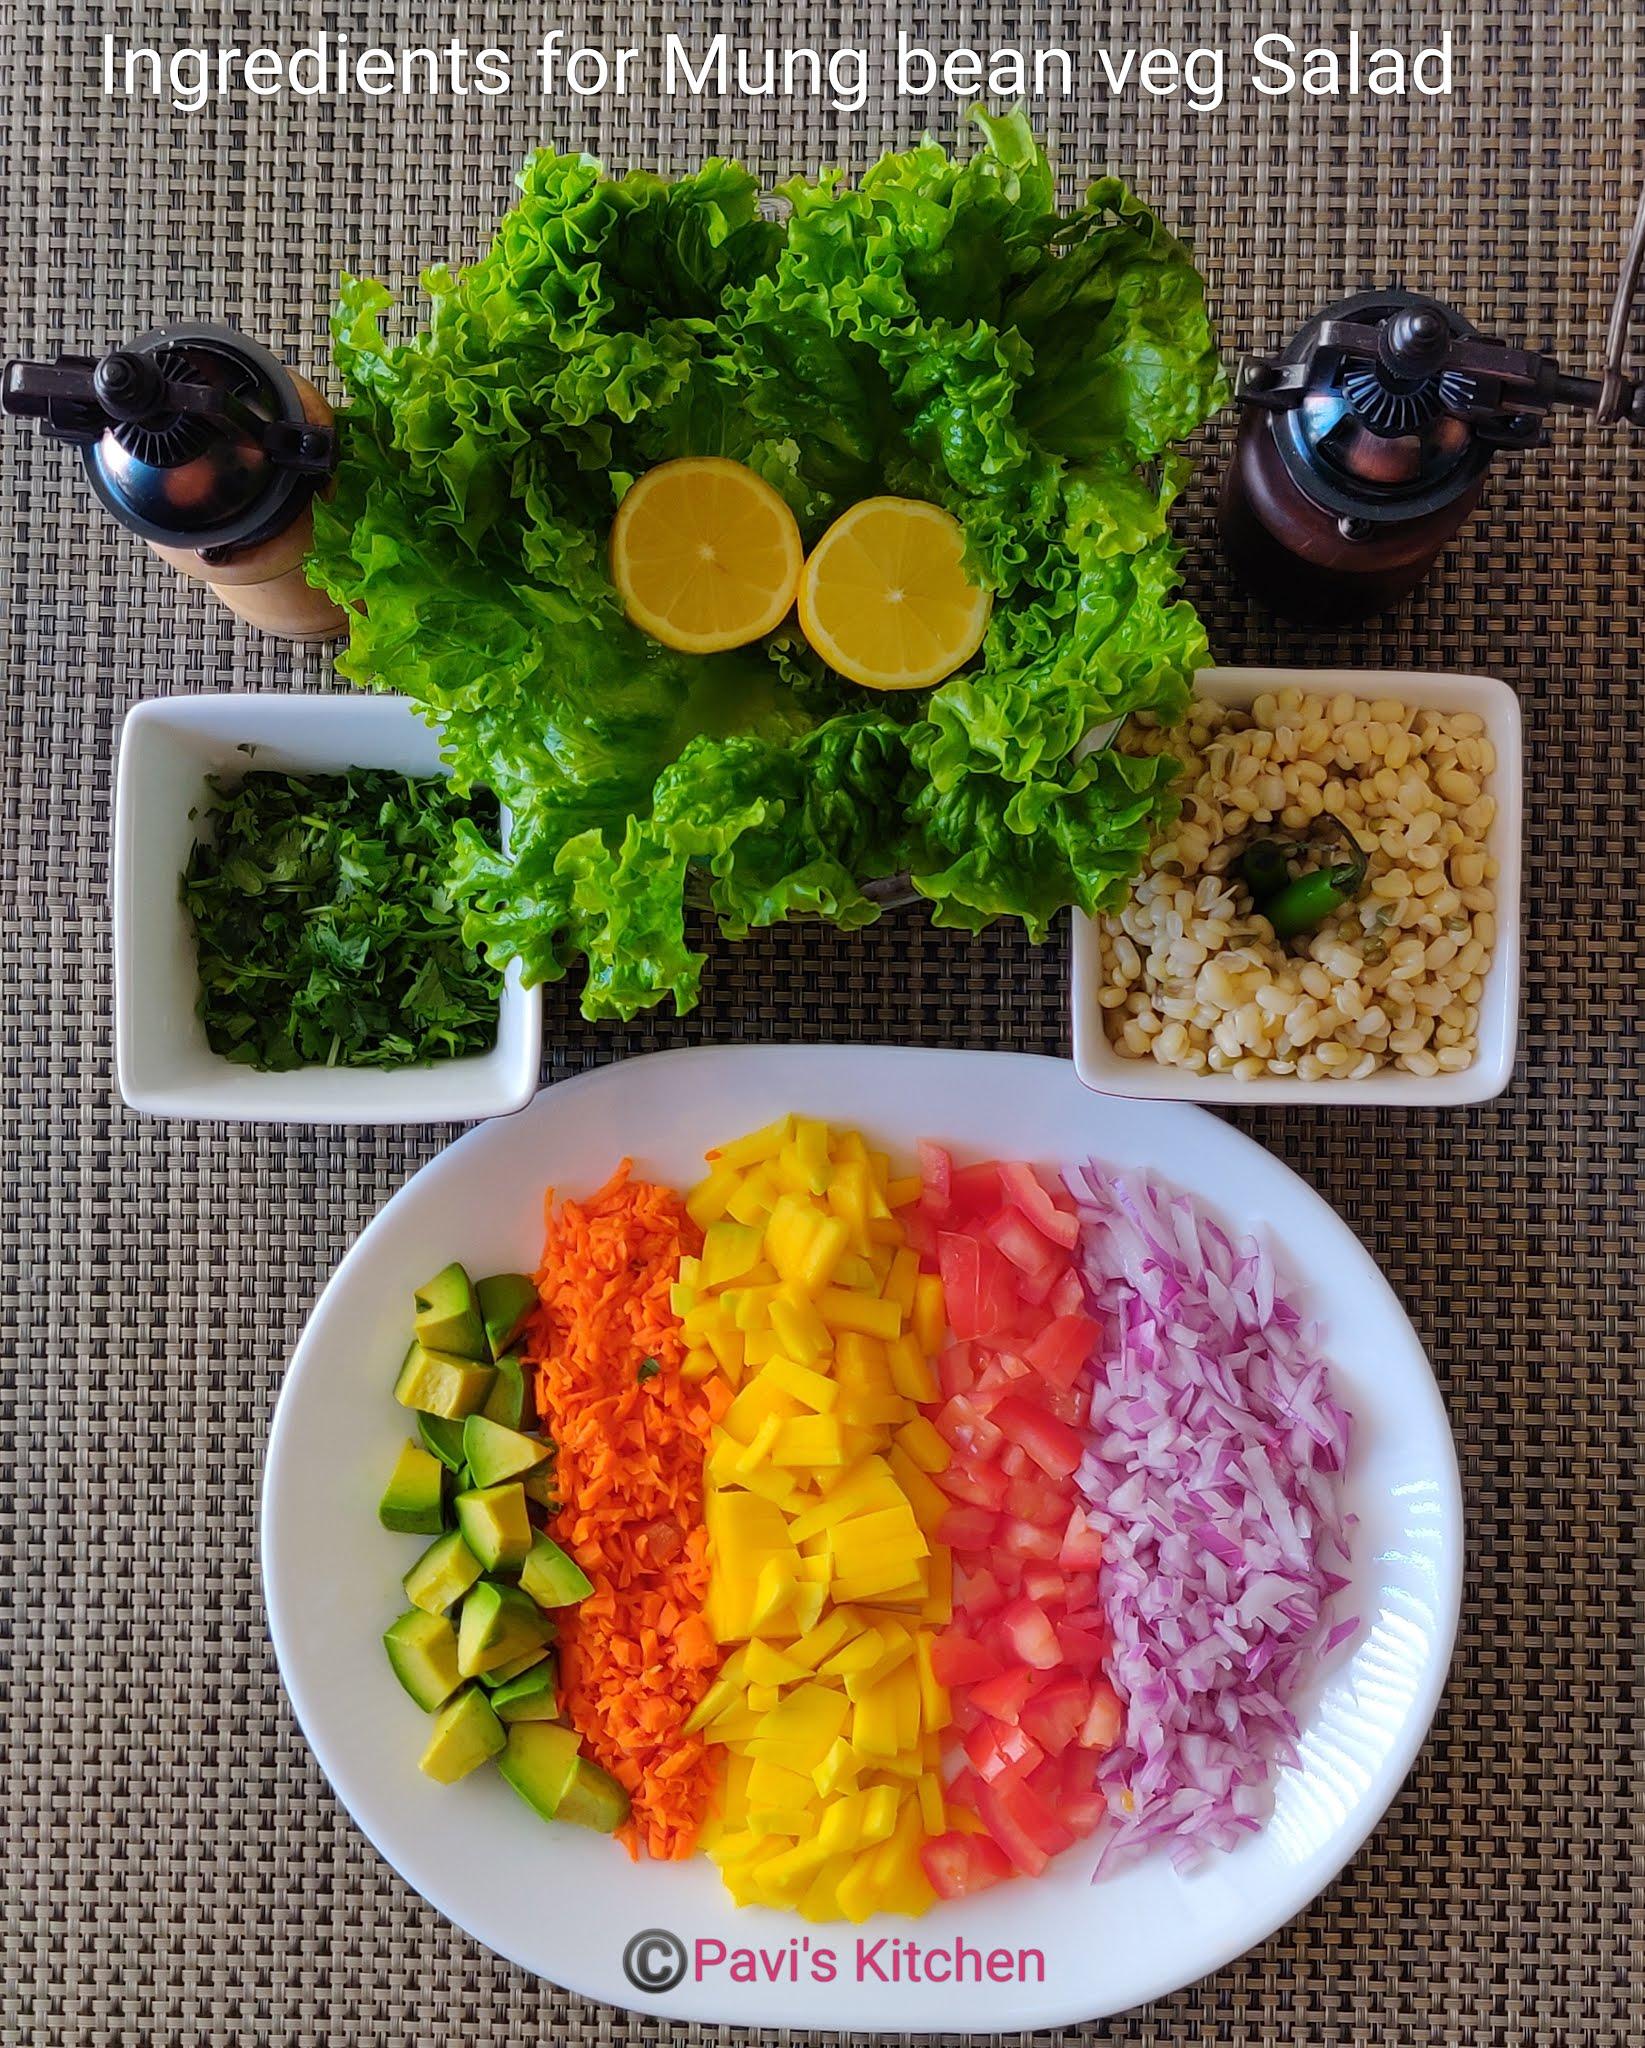 Lettuce salad recipe | Indian mung bean salad | Boiled moong dal salad